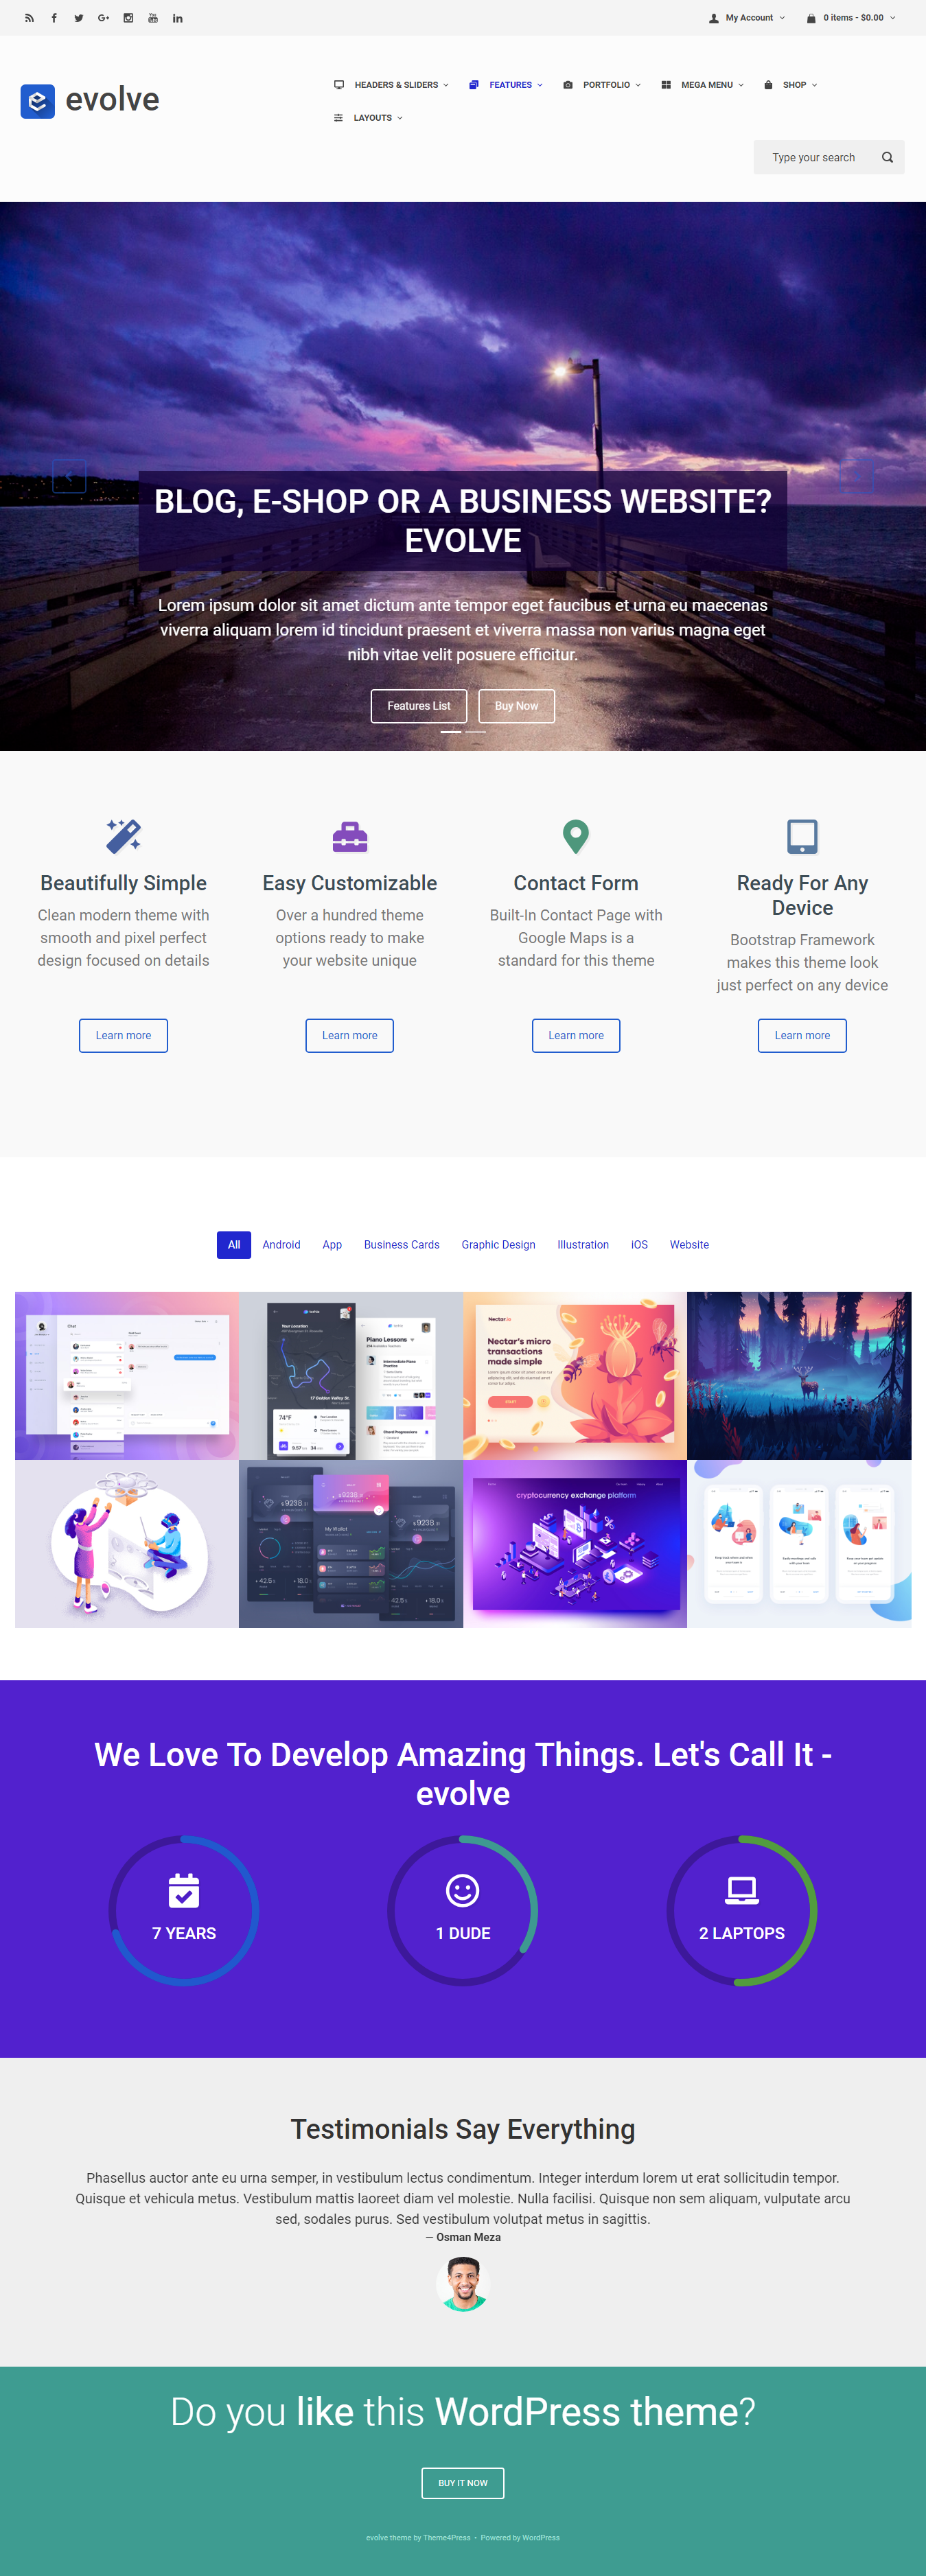 Evolve - Best Free BuddyPress WordPress Theme